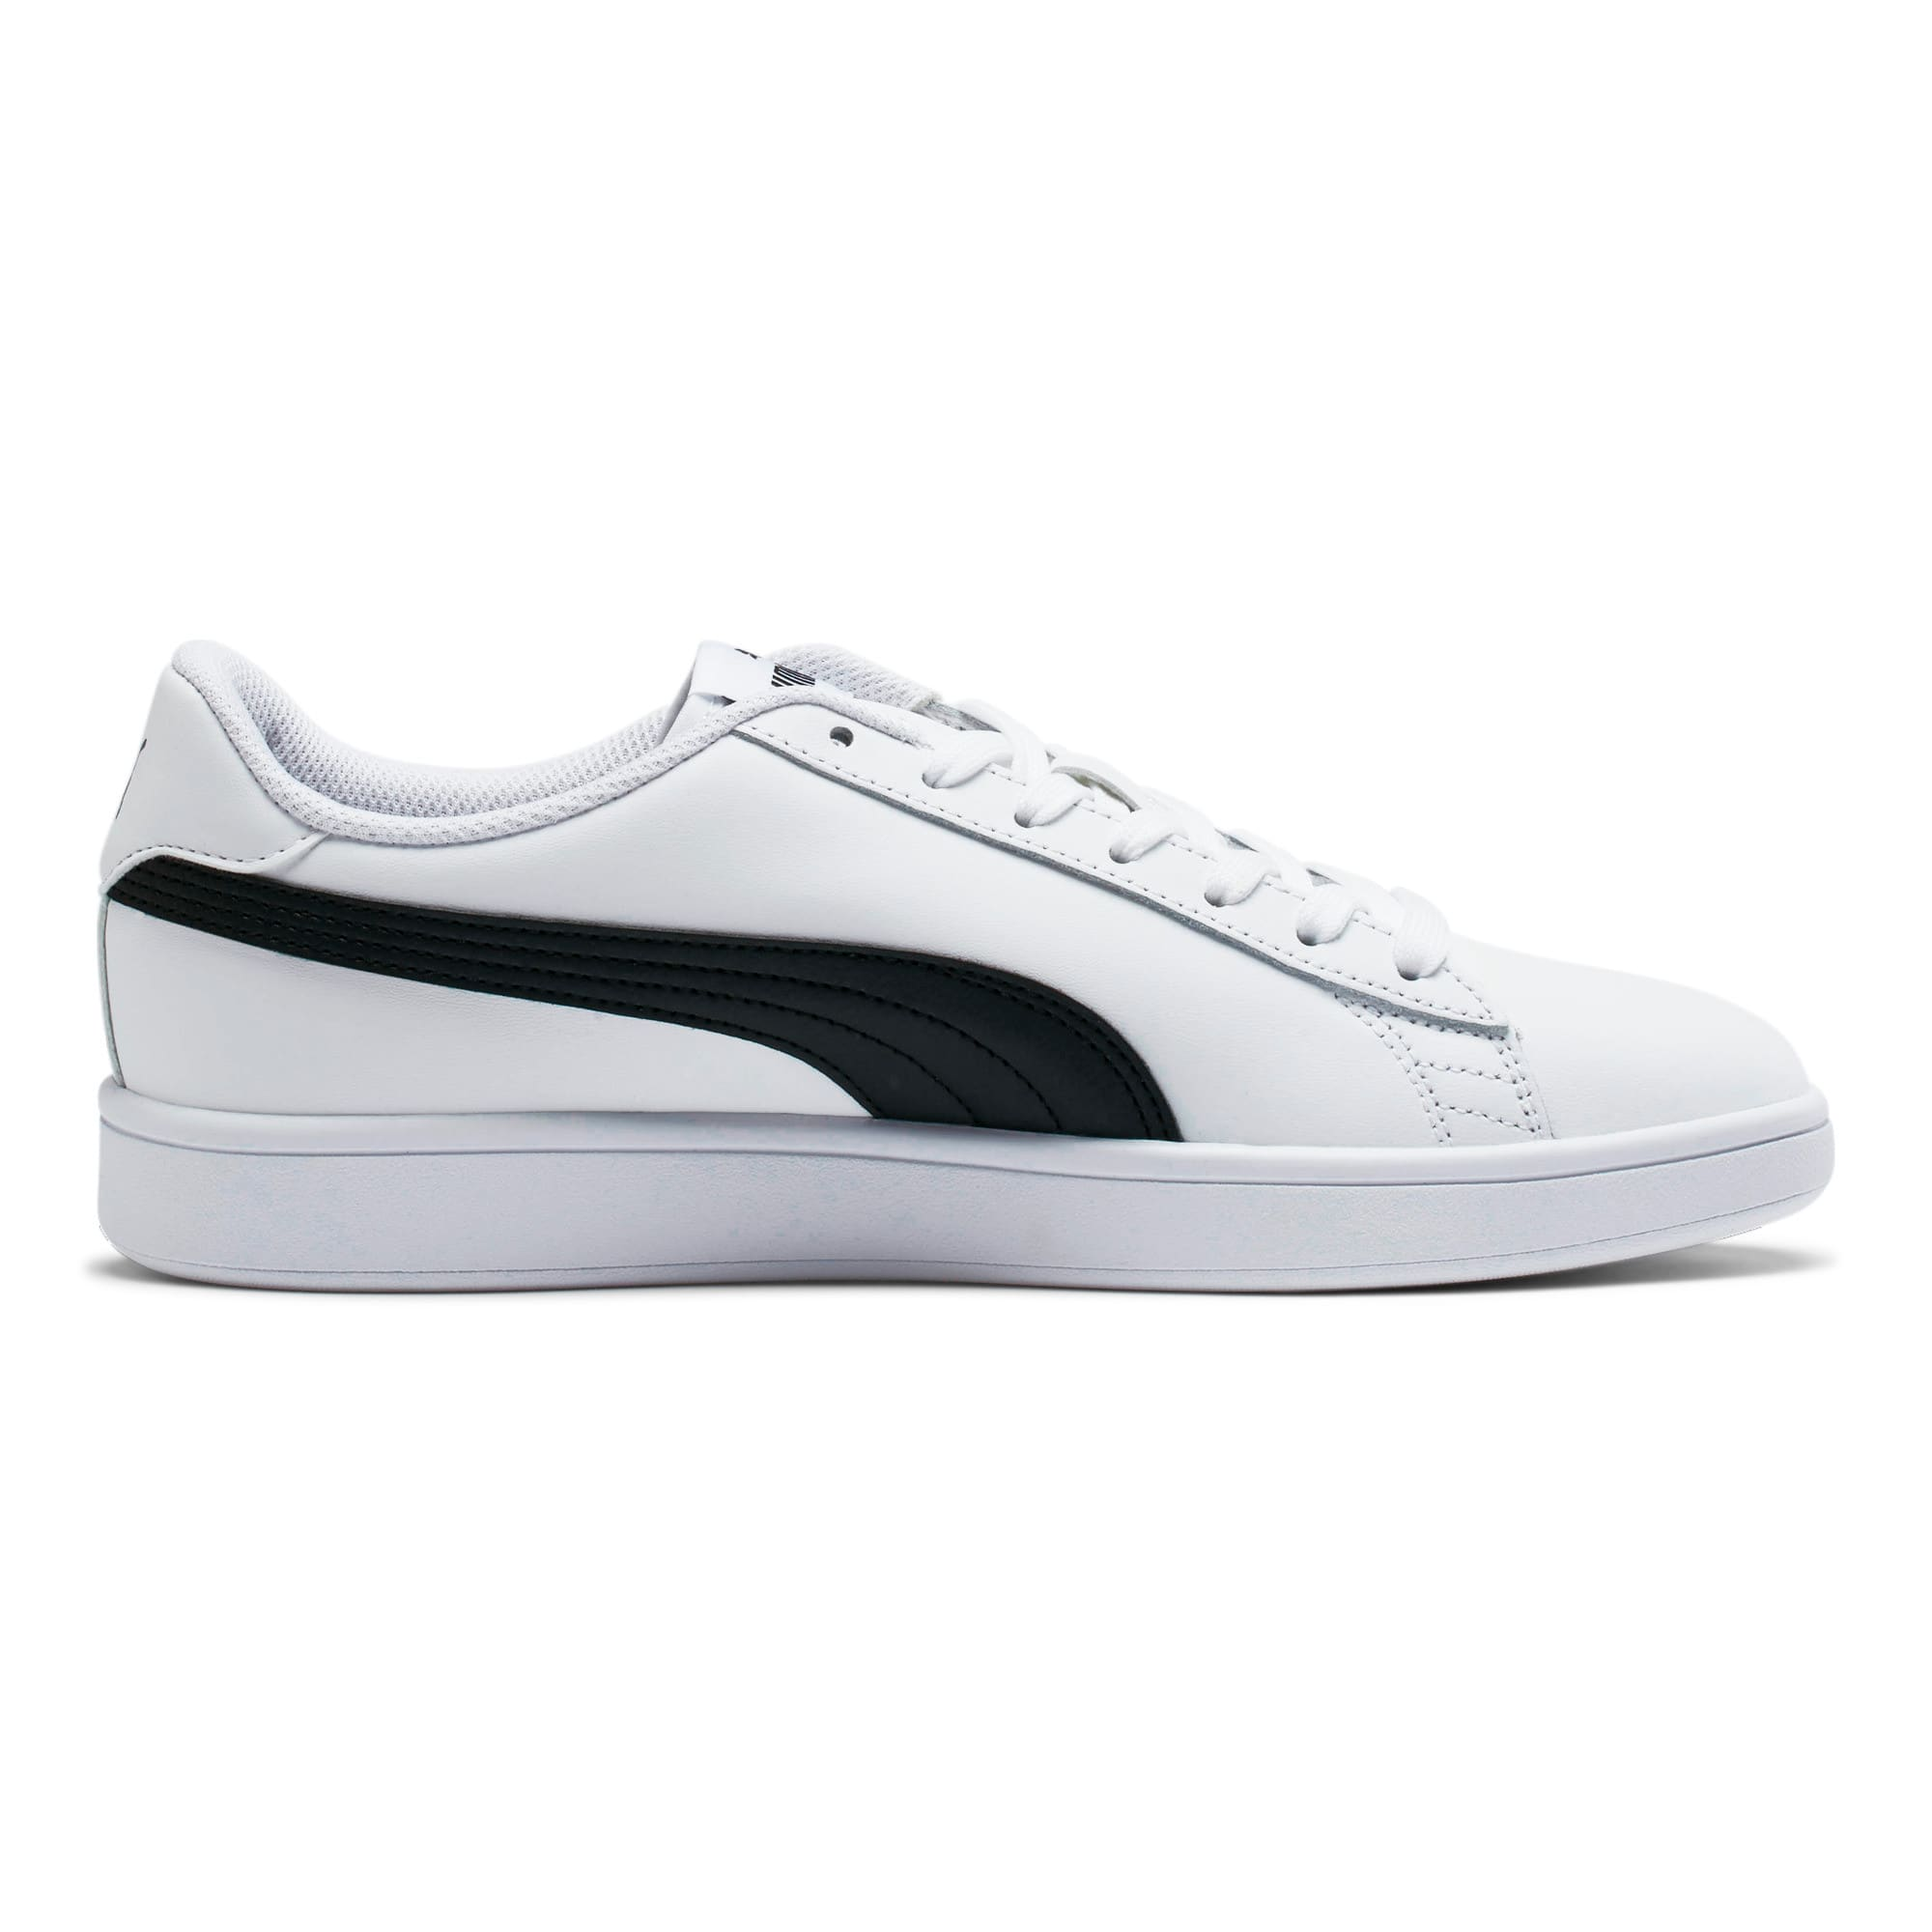 Thumbnail 5 of Smash v2 Leather Sneakers, Puma White-Puma Black, medium